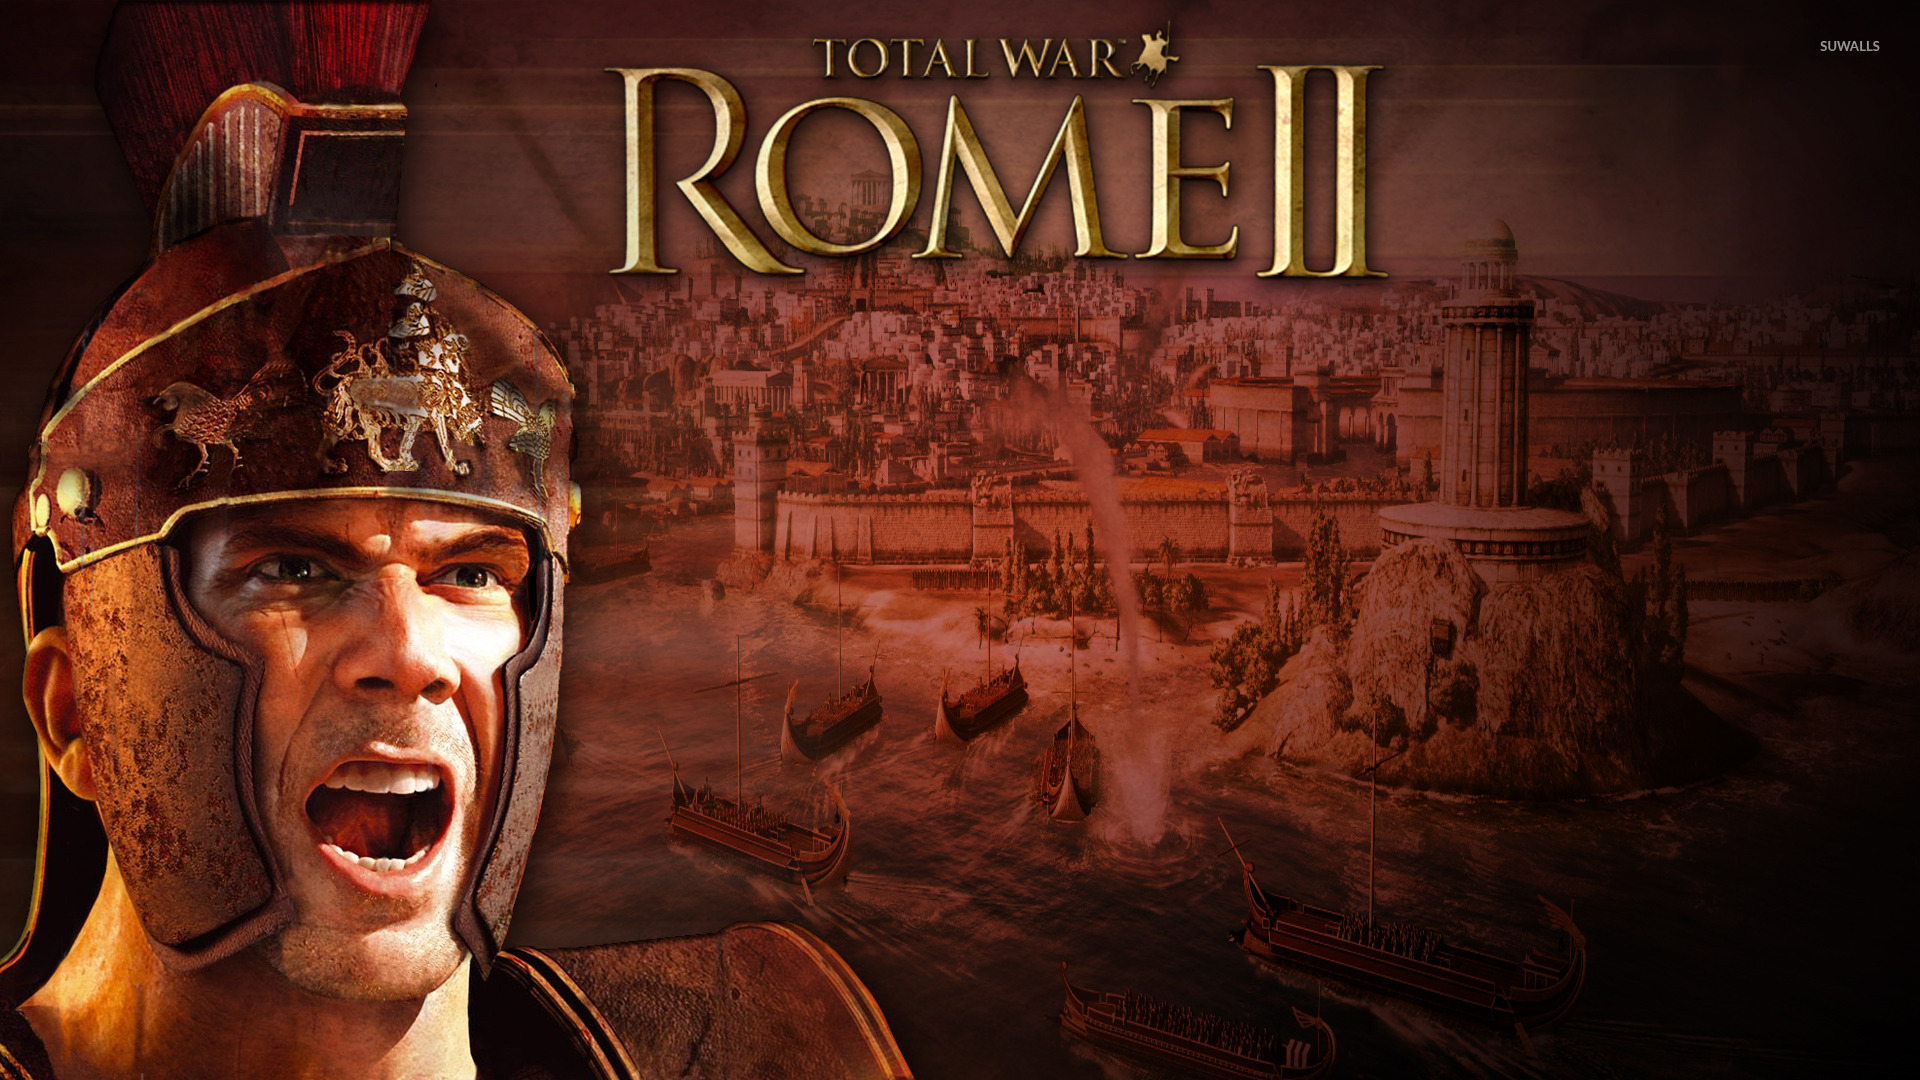 roman war wallpaper - photo #25